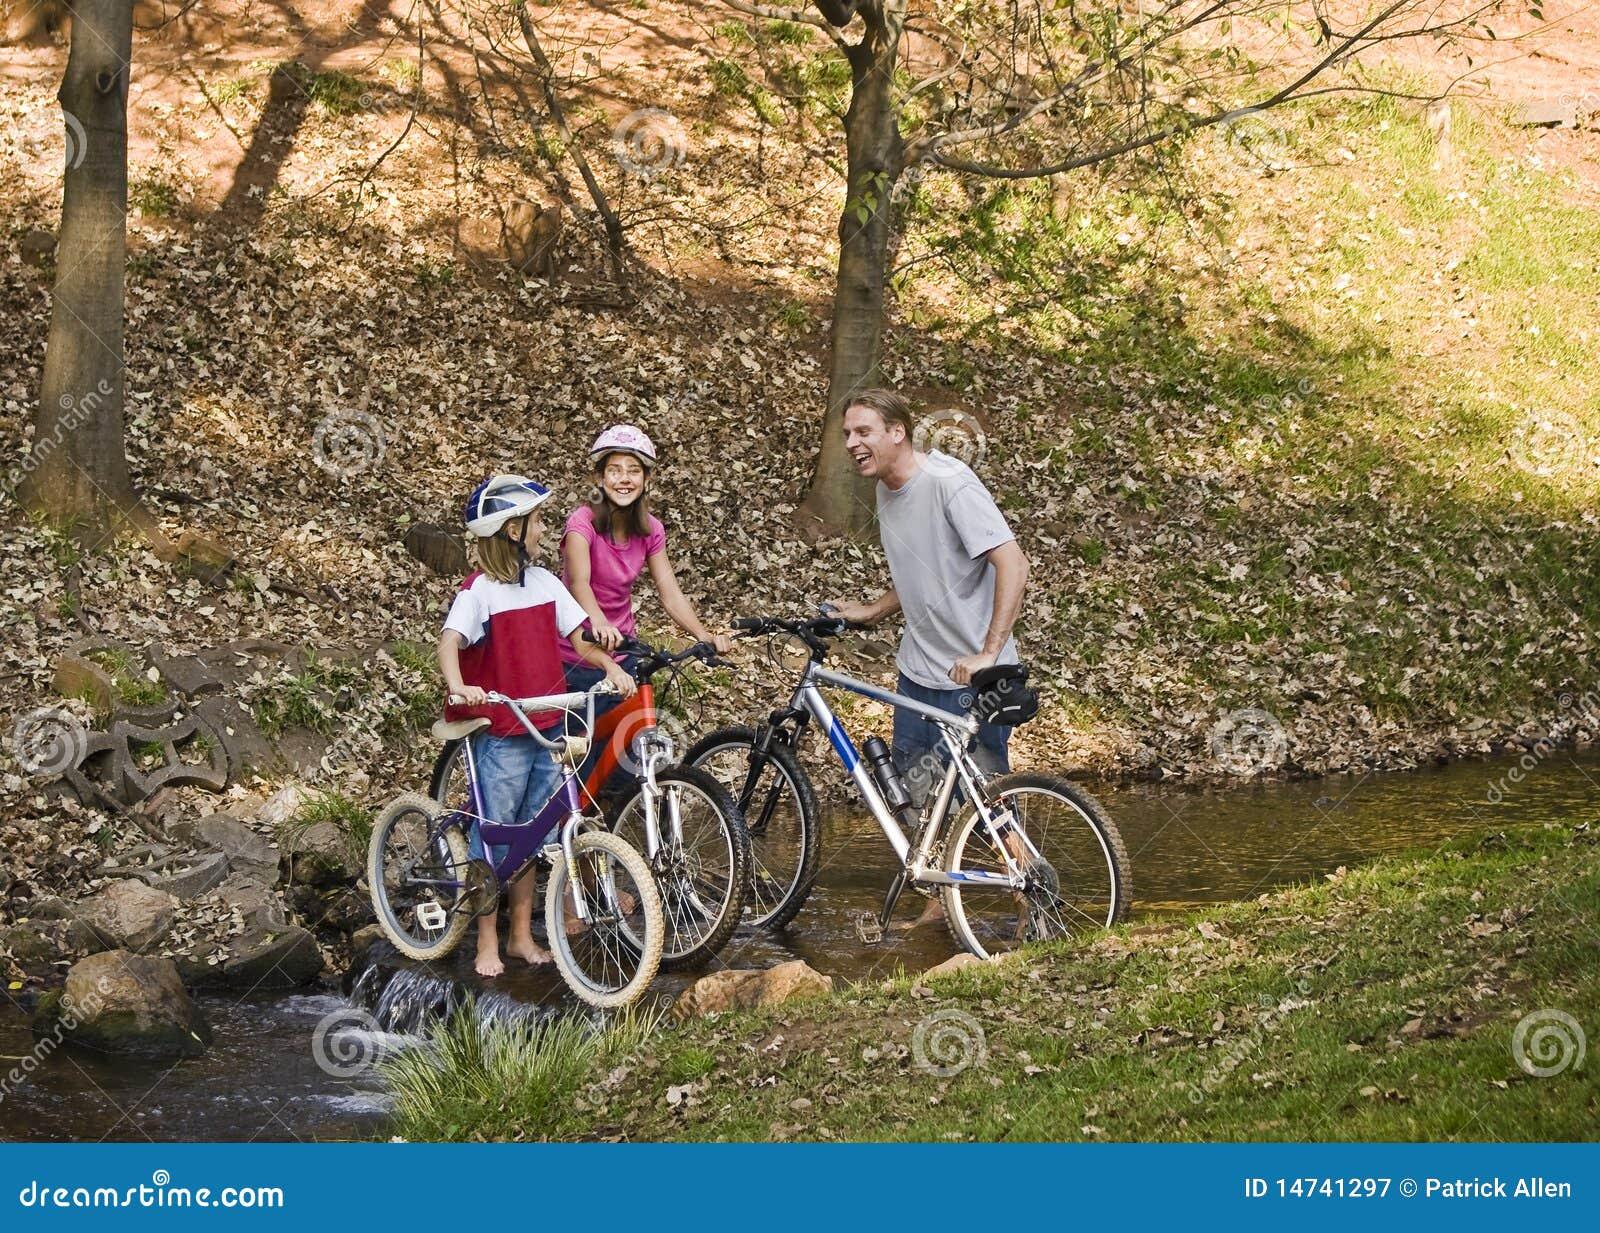 https://thumbs.dreamstime.com/z/bicycle-ride-park-14741297.jpg